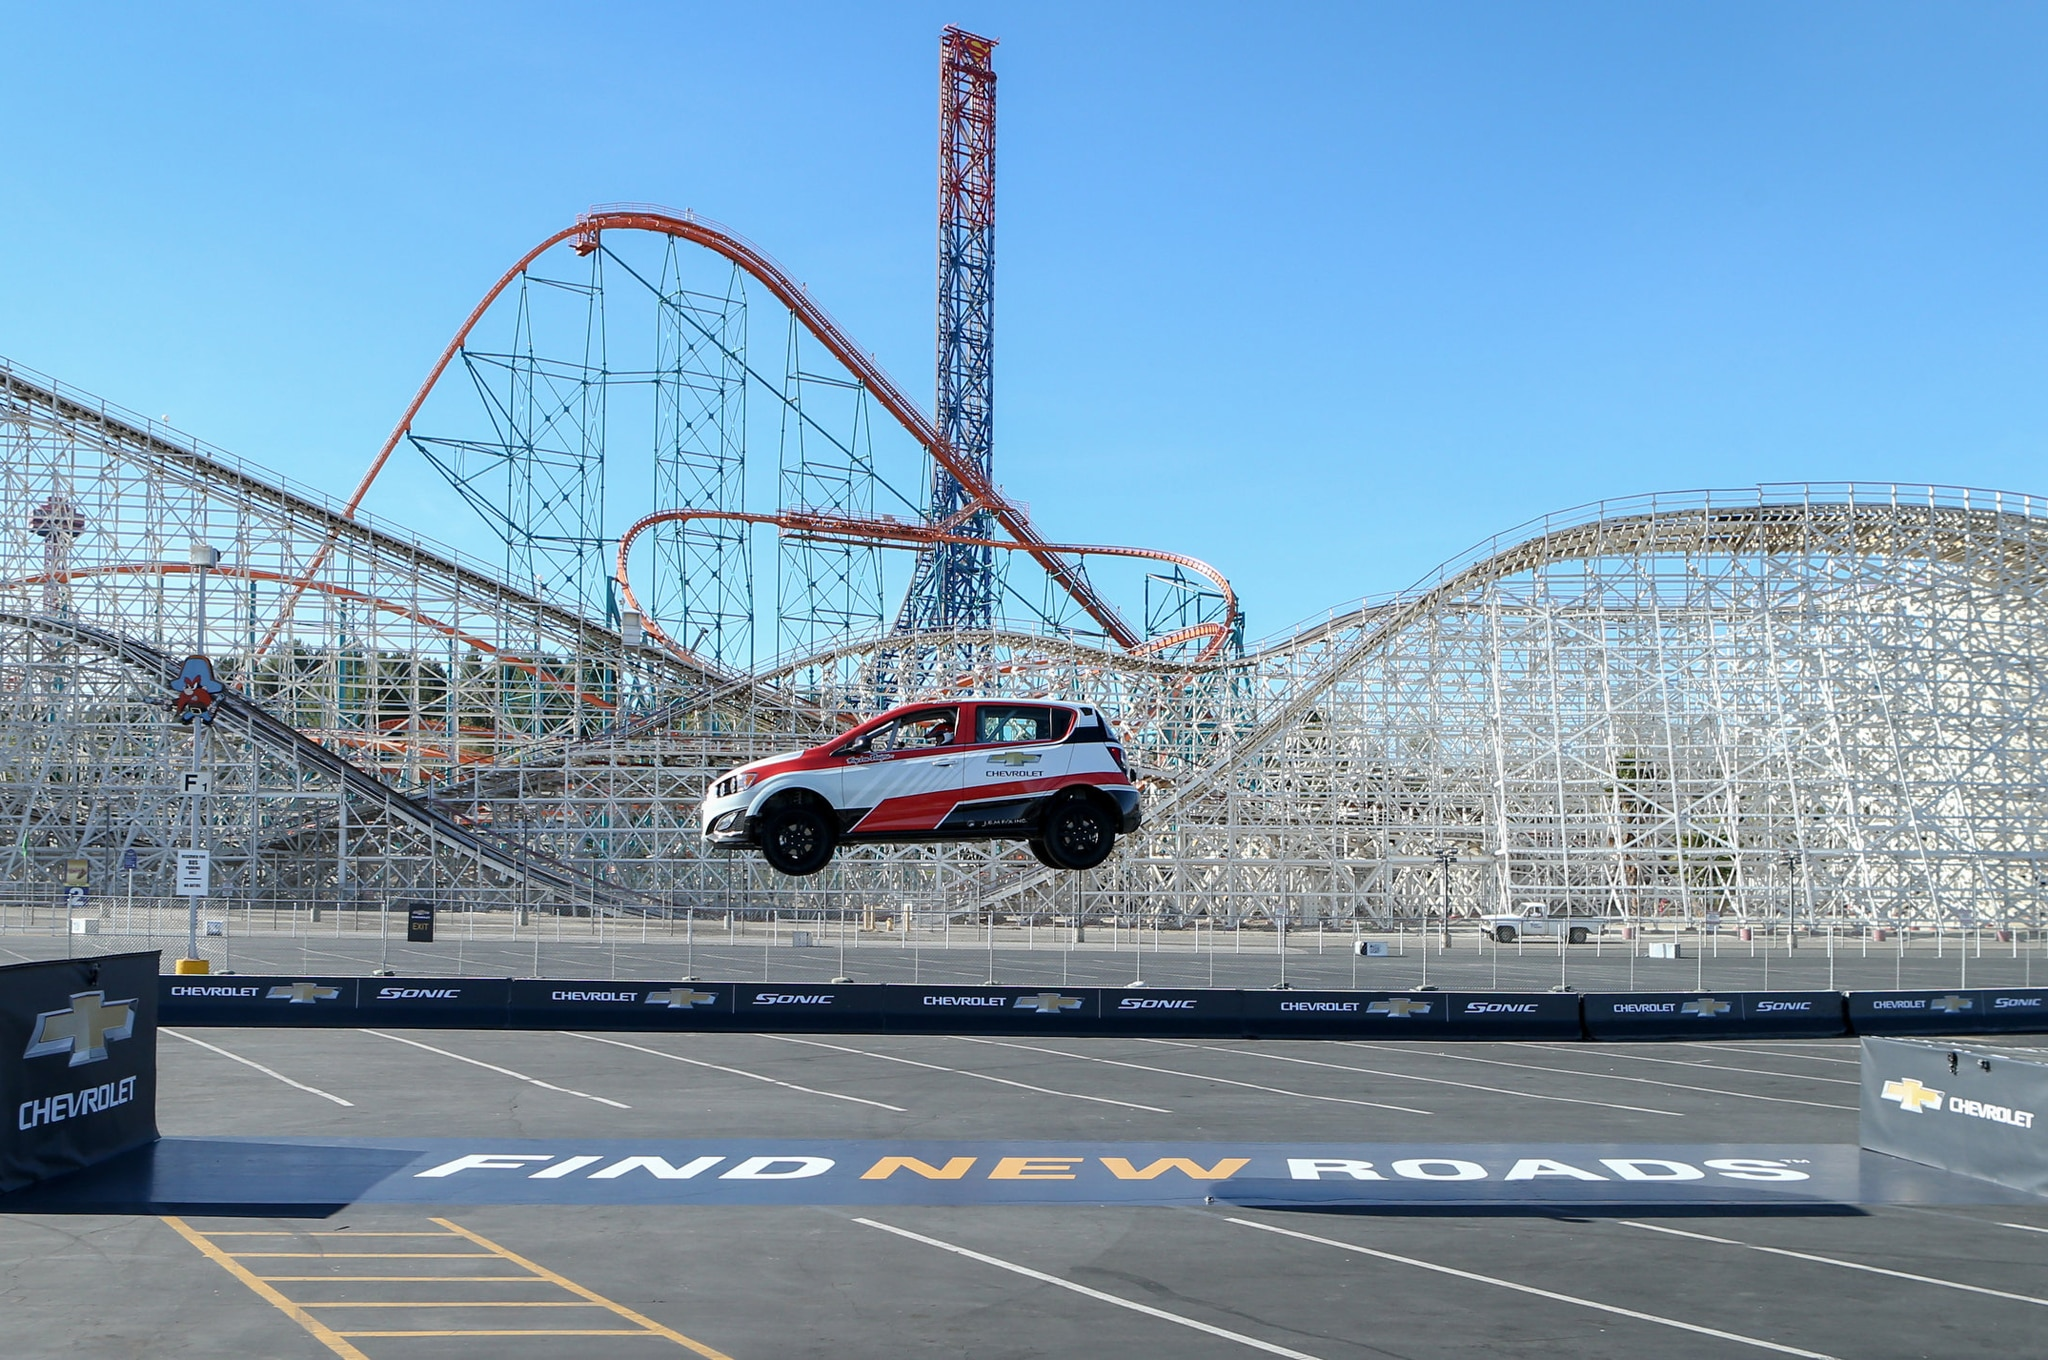 2014 Chevrolet Sonic Rs Ramp Stunt